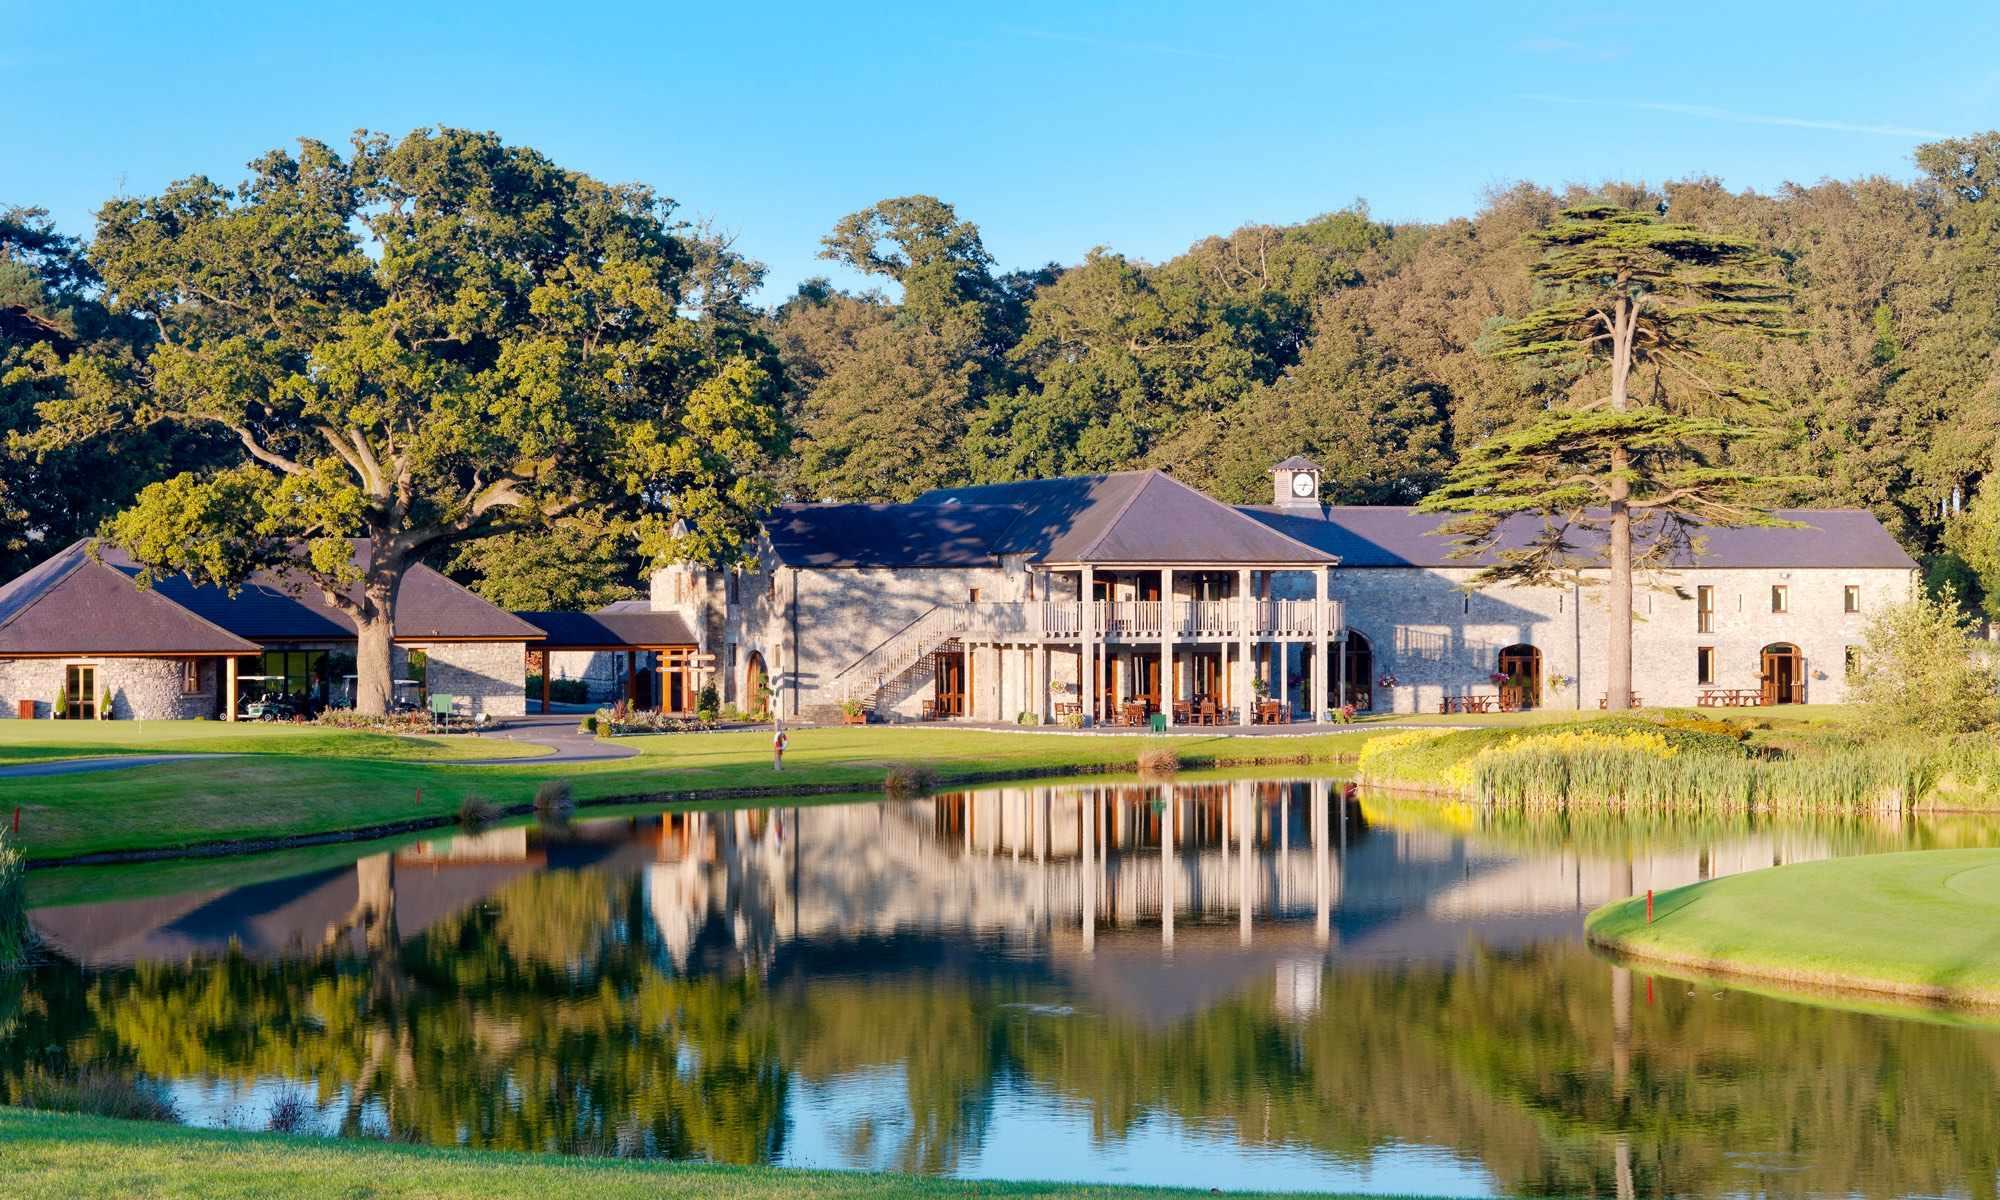 Fota Island Golf Resort & Country Club